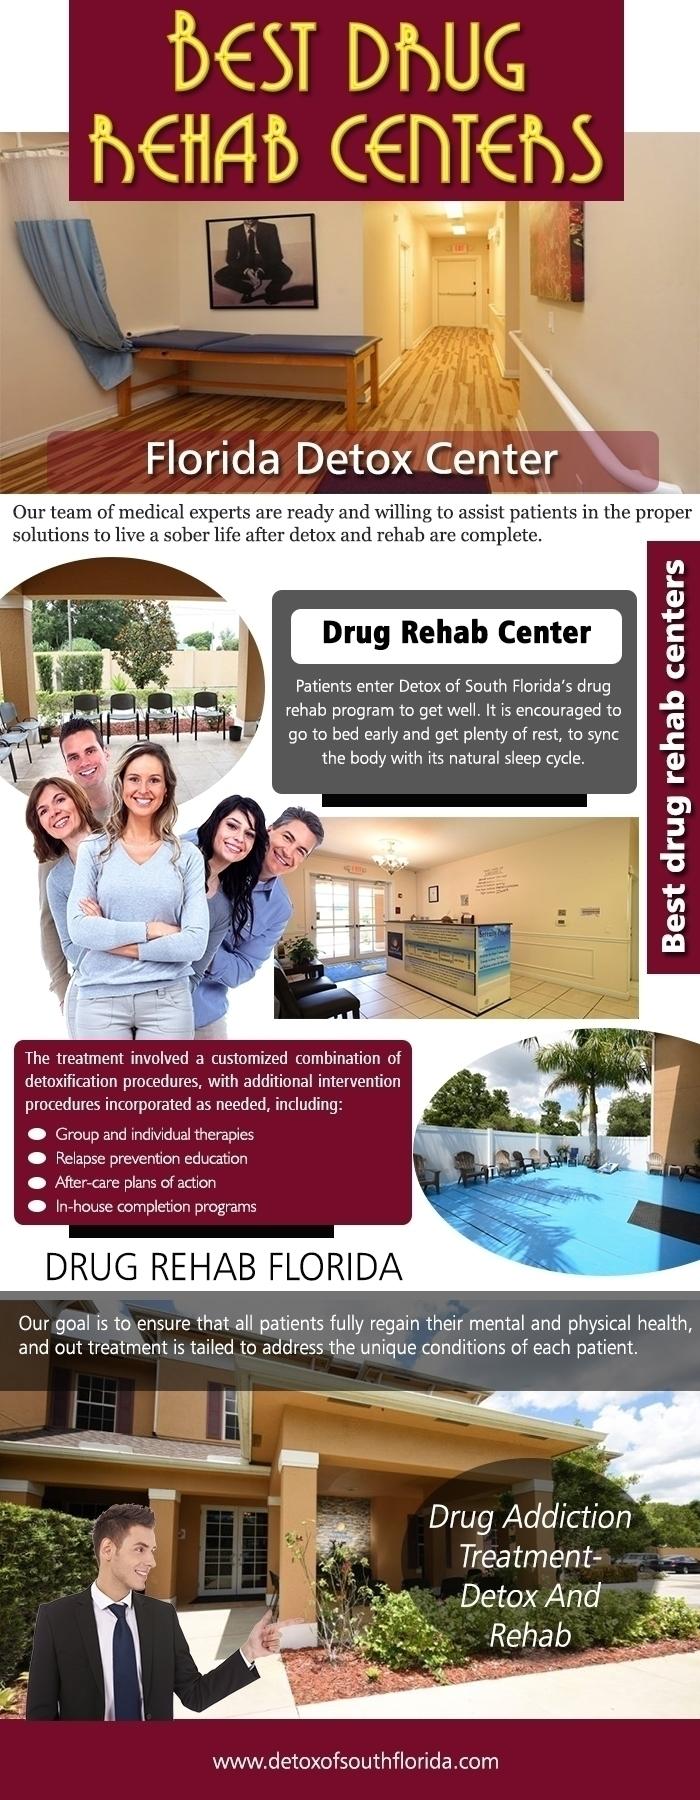 South Florida drug rehab Websit - detoxofsouthflorid | ello